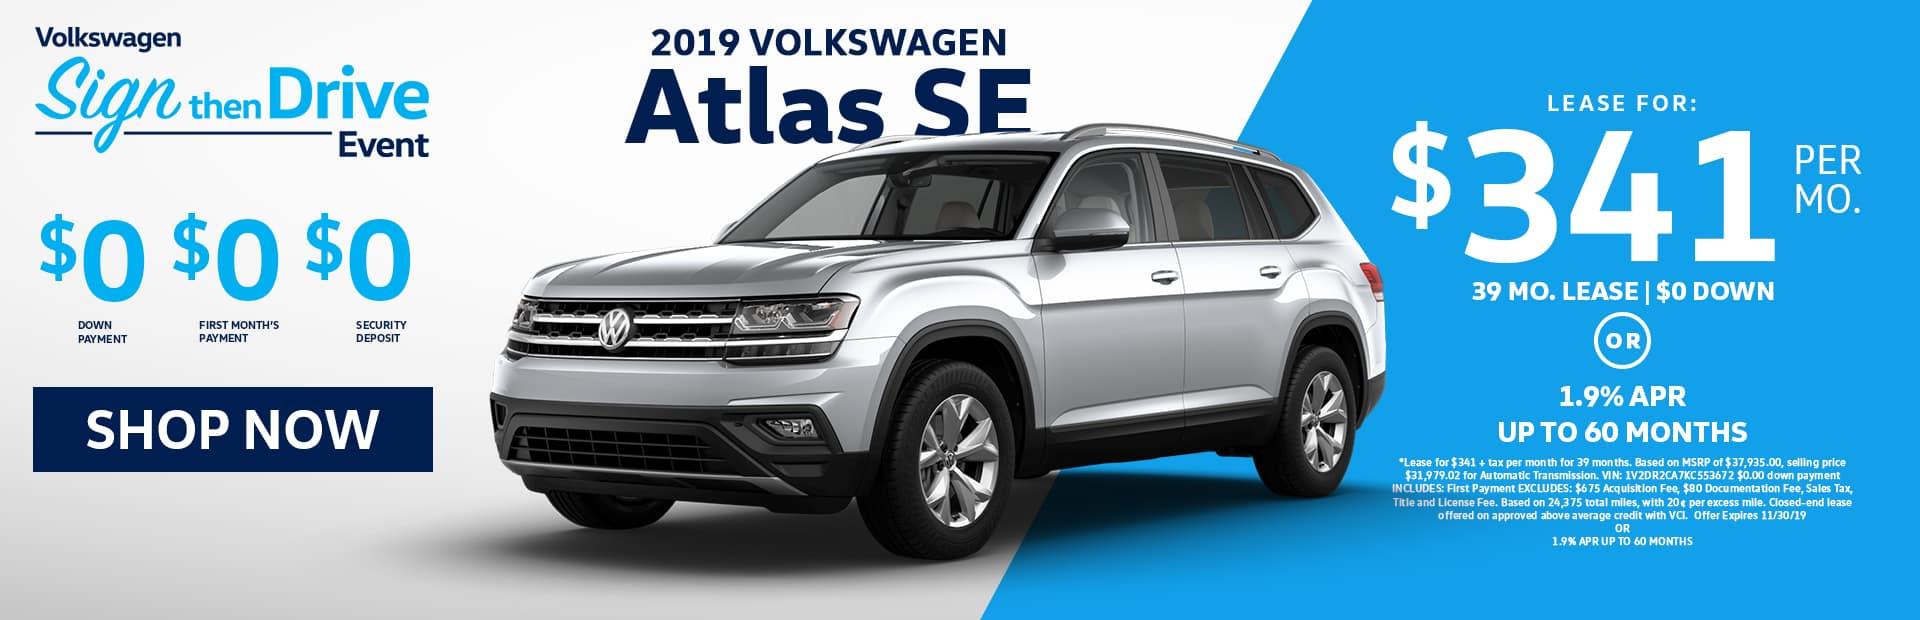 VW Atlas SE lease offer near me in glendale and los angeles